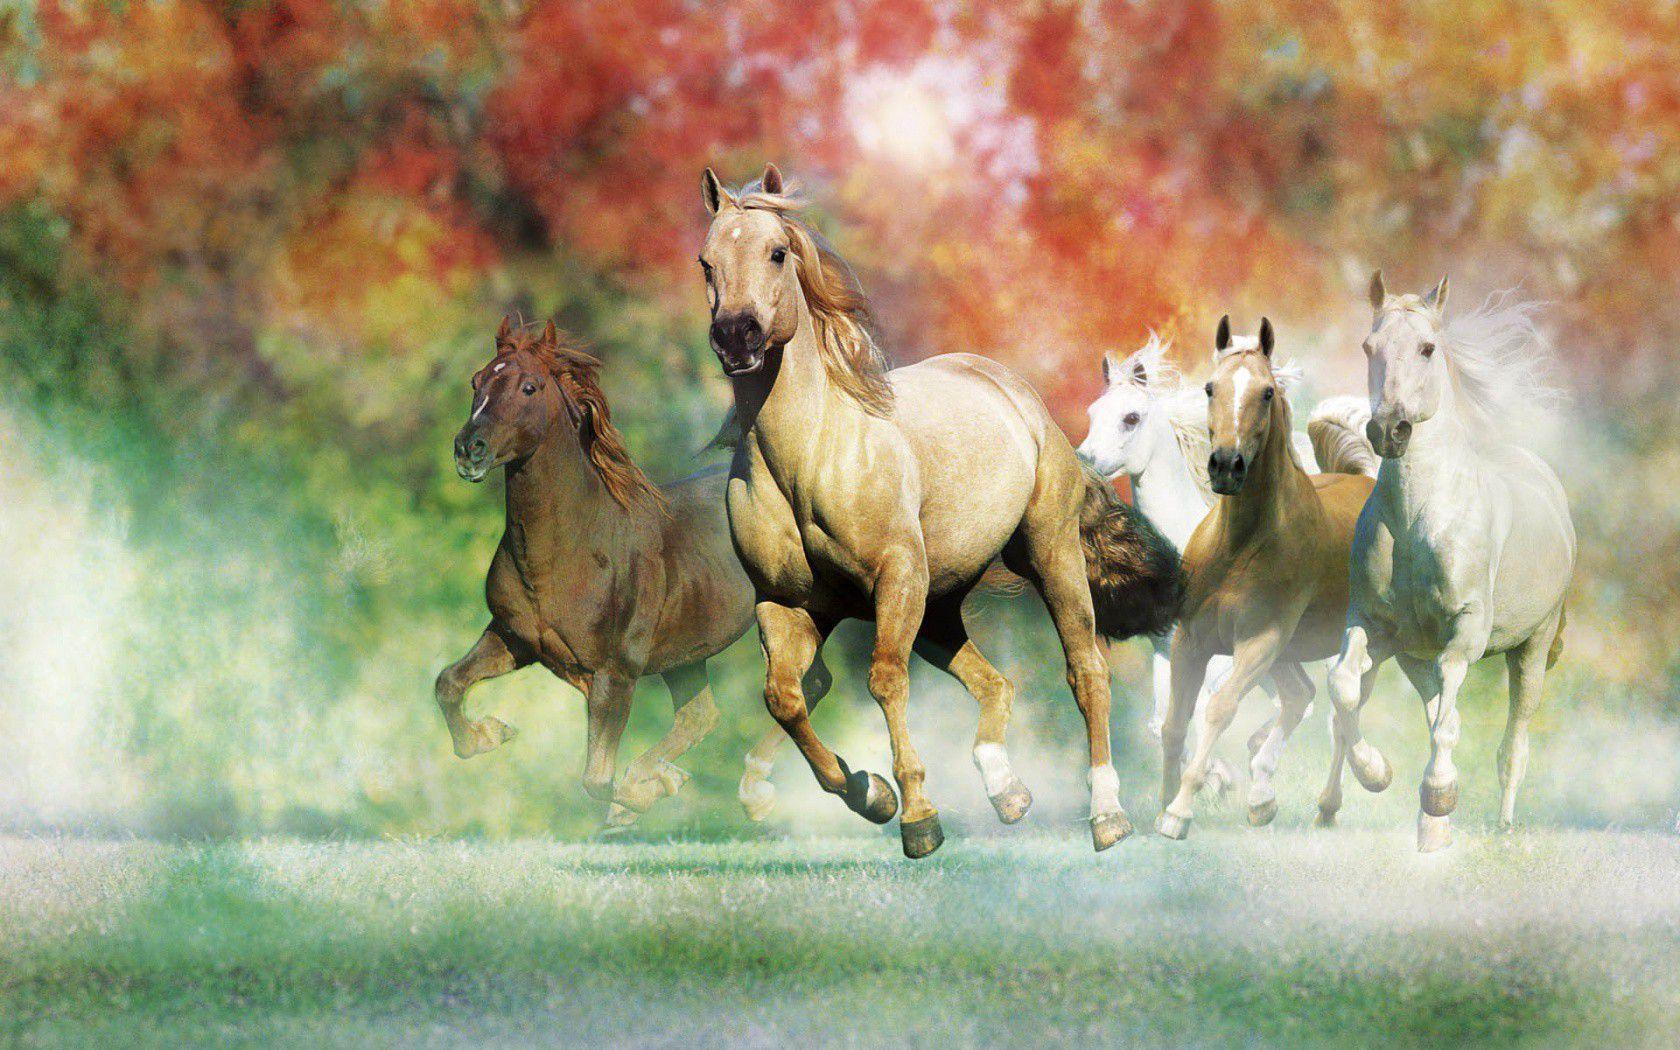 Horse Art Wallpapers - Wallpaper Cave